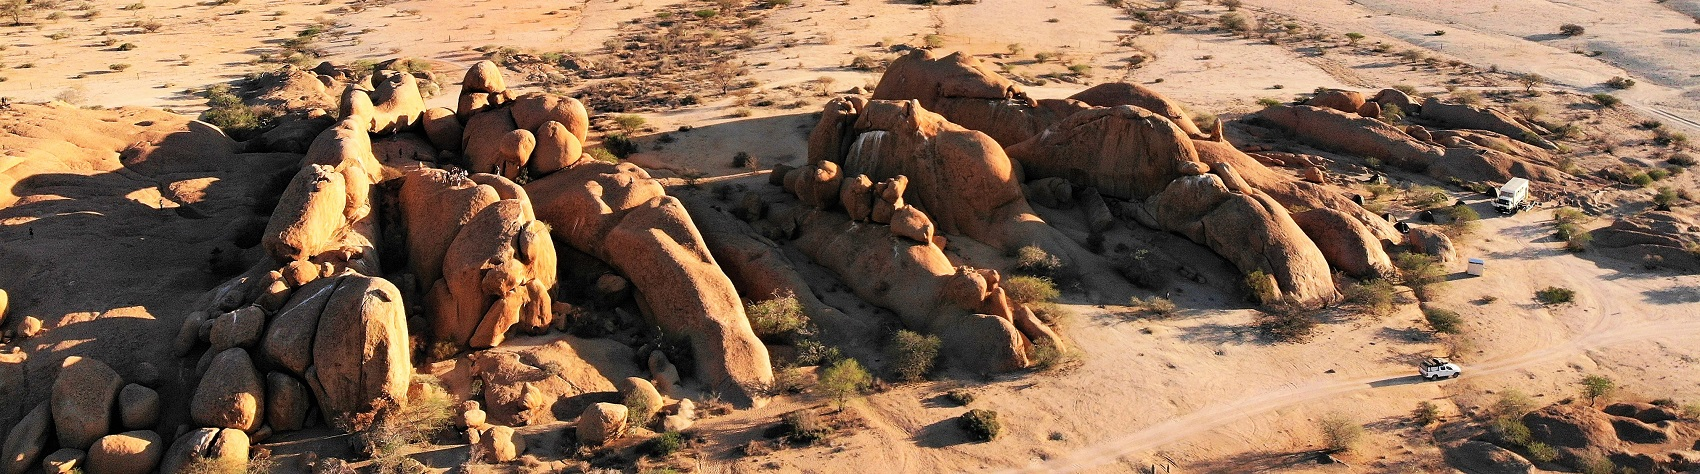 10 best campsites in Namibia